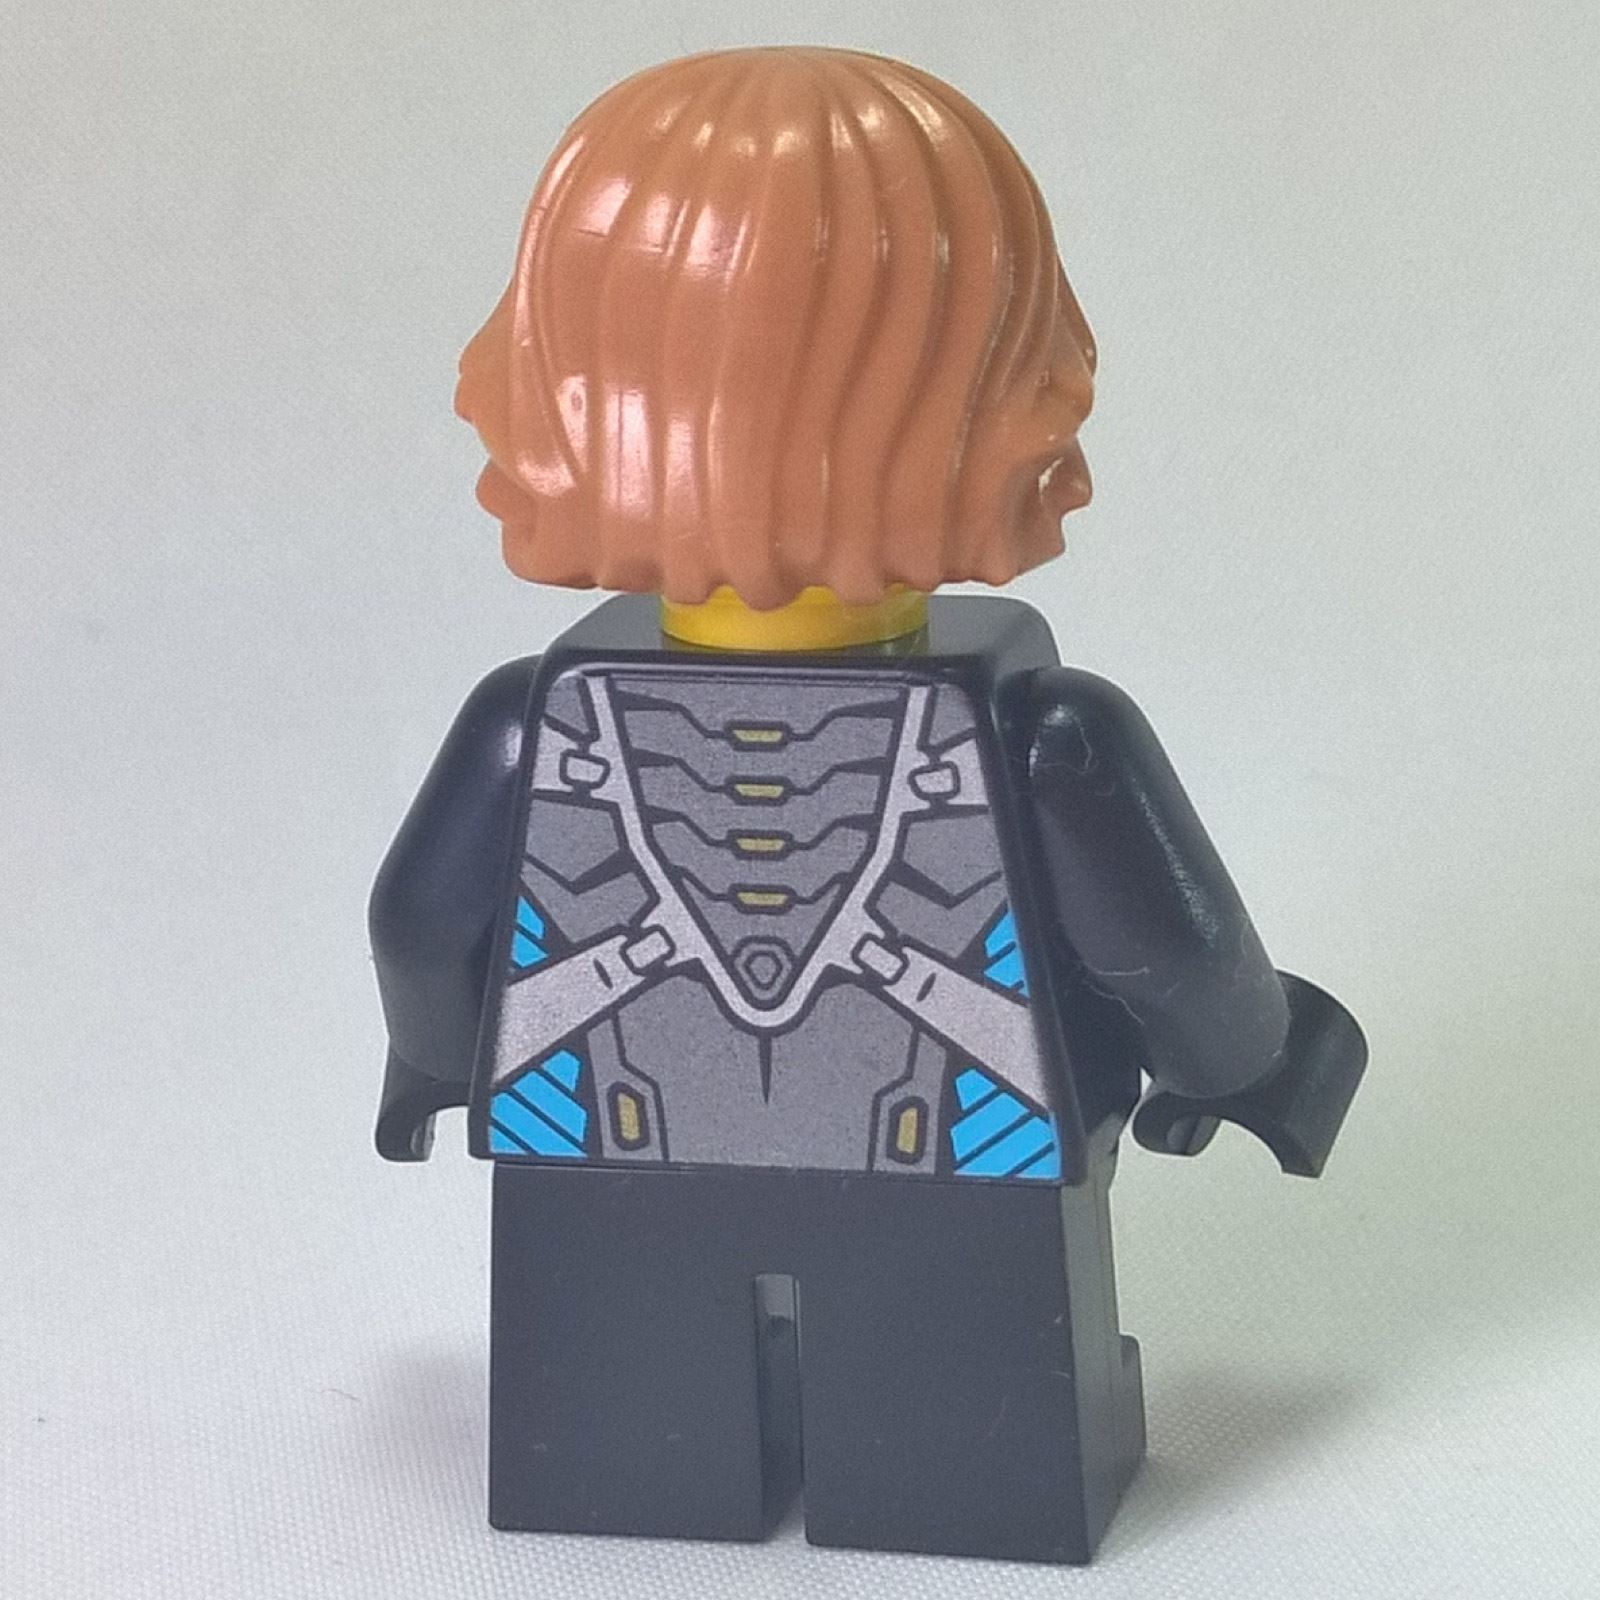 nex085 New lego robin underwood with jet pack from set 271714 nexo knights